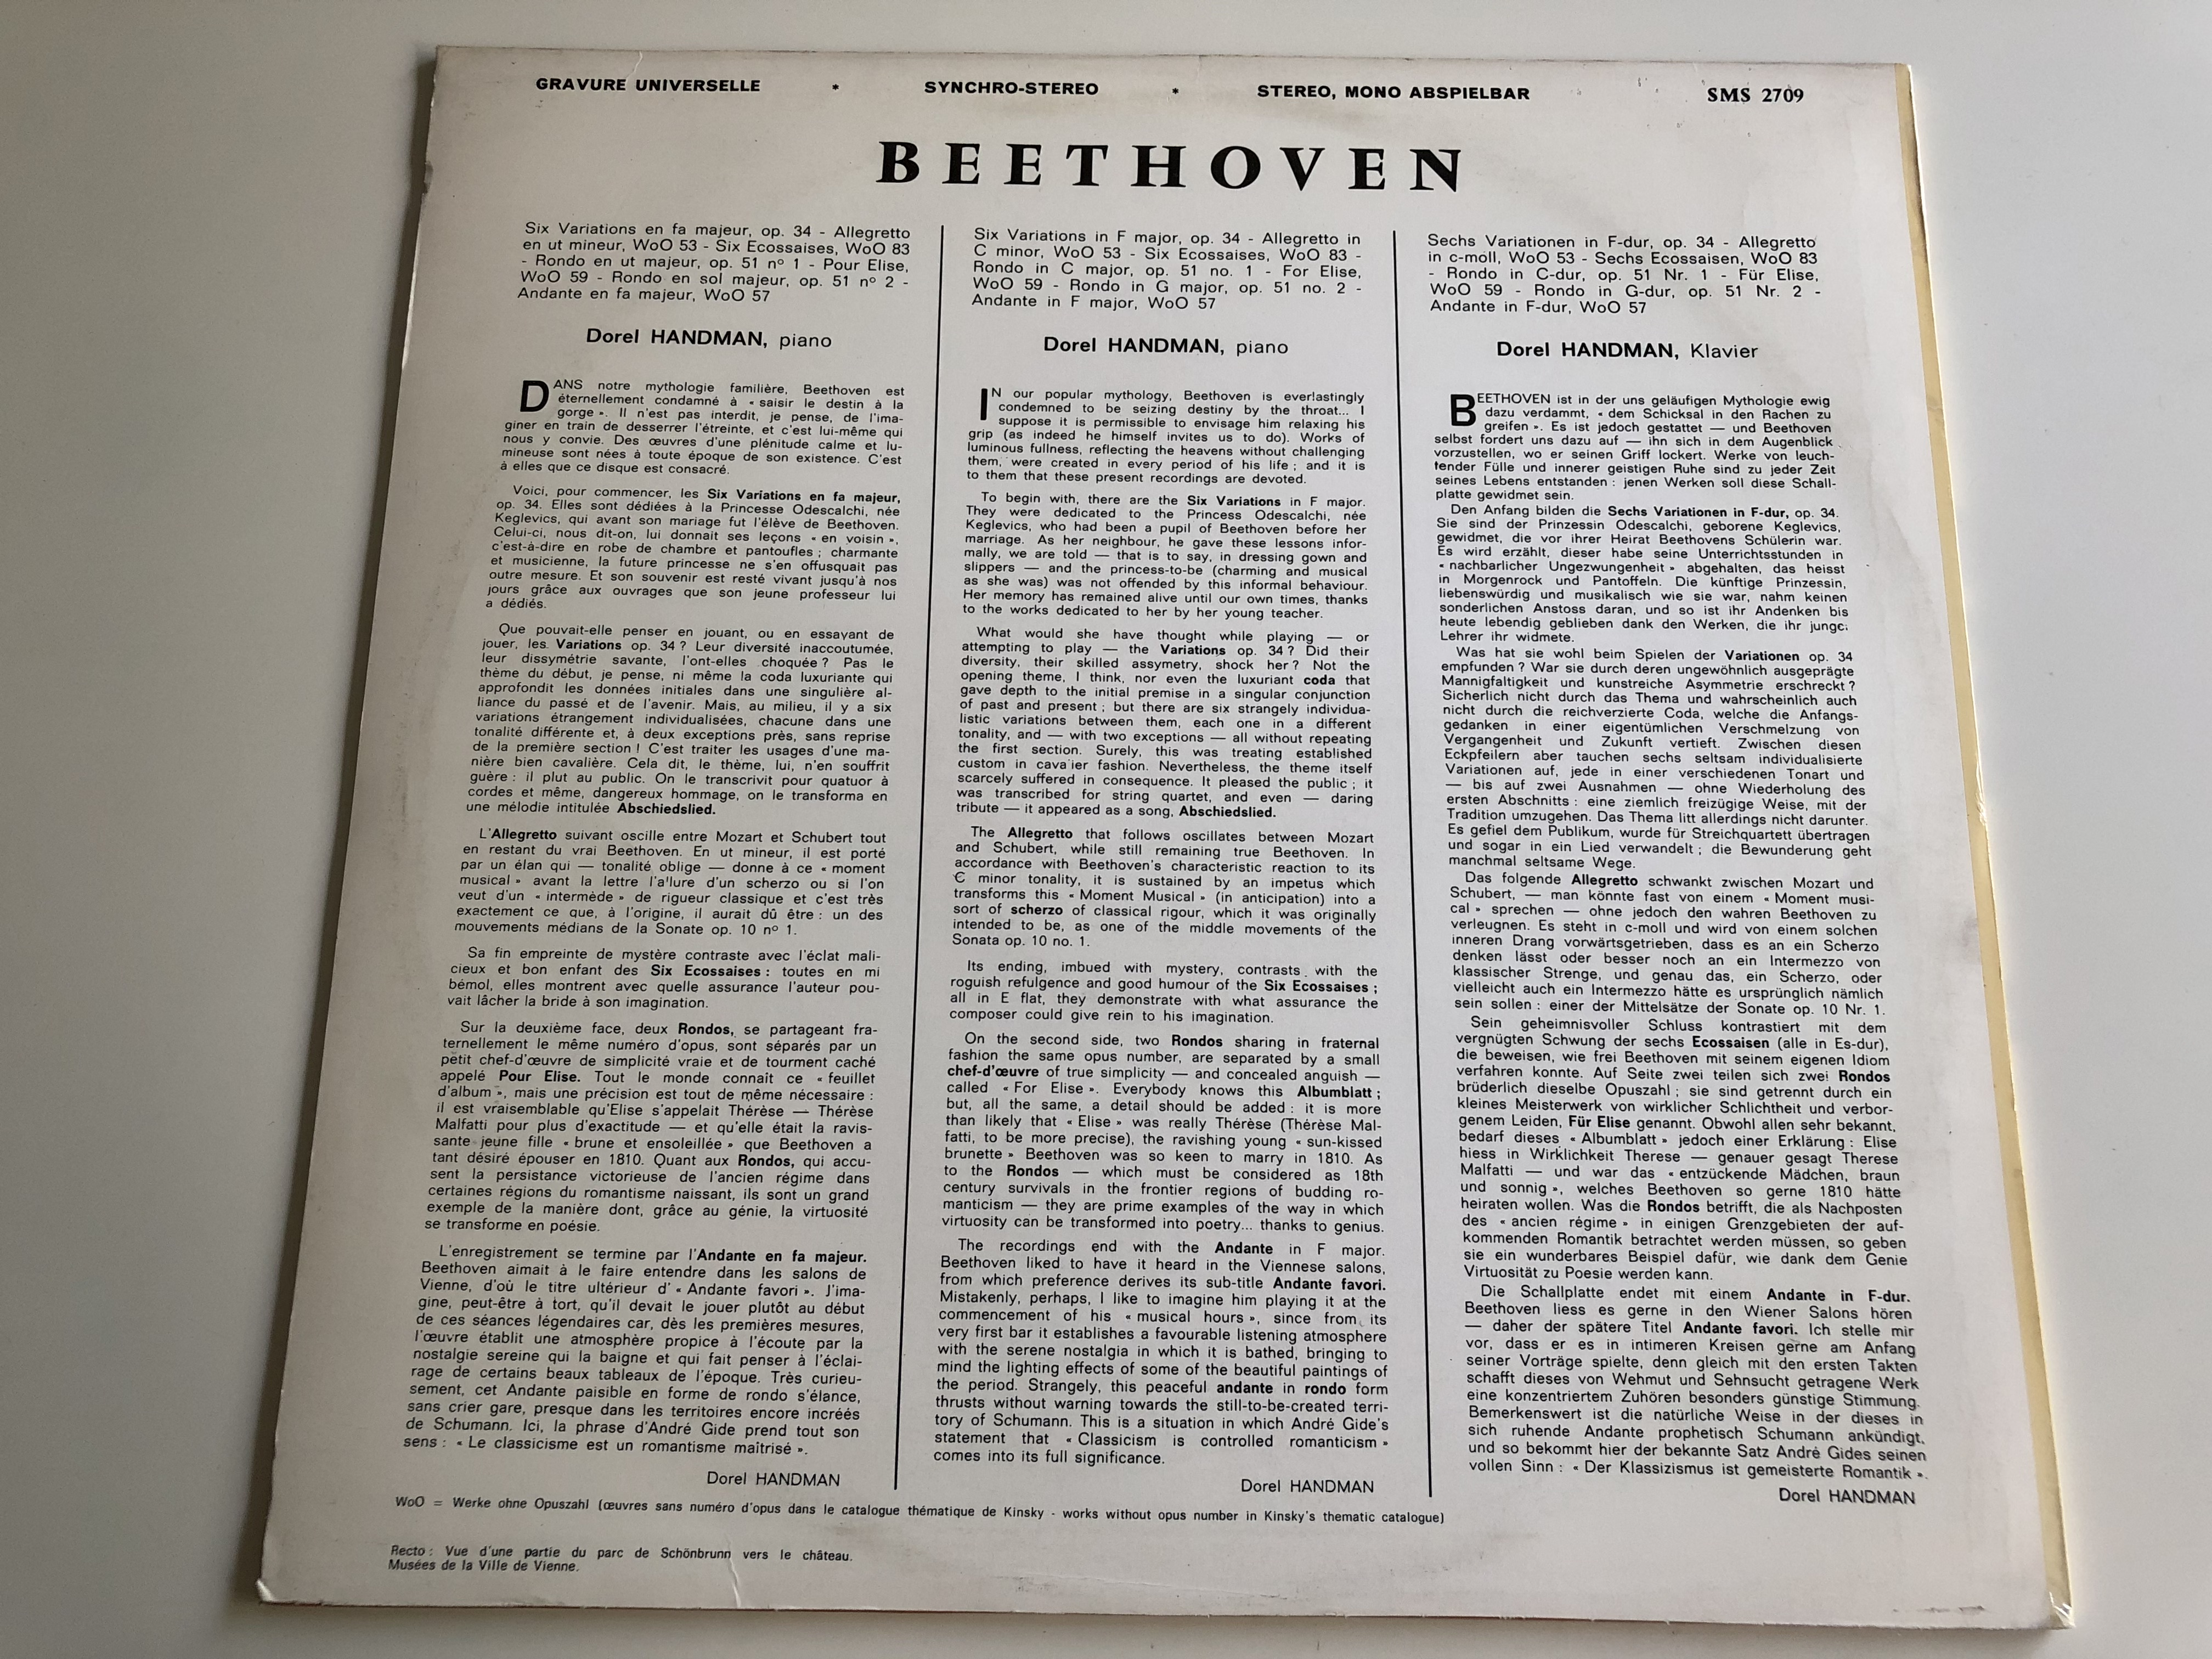 beethoven-recital-dorel-handman-piano-gravure-universelle-synchro-stereo-sms-2709-2-.jpg